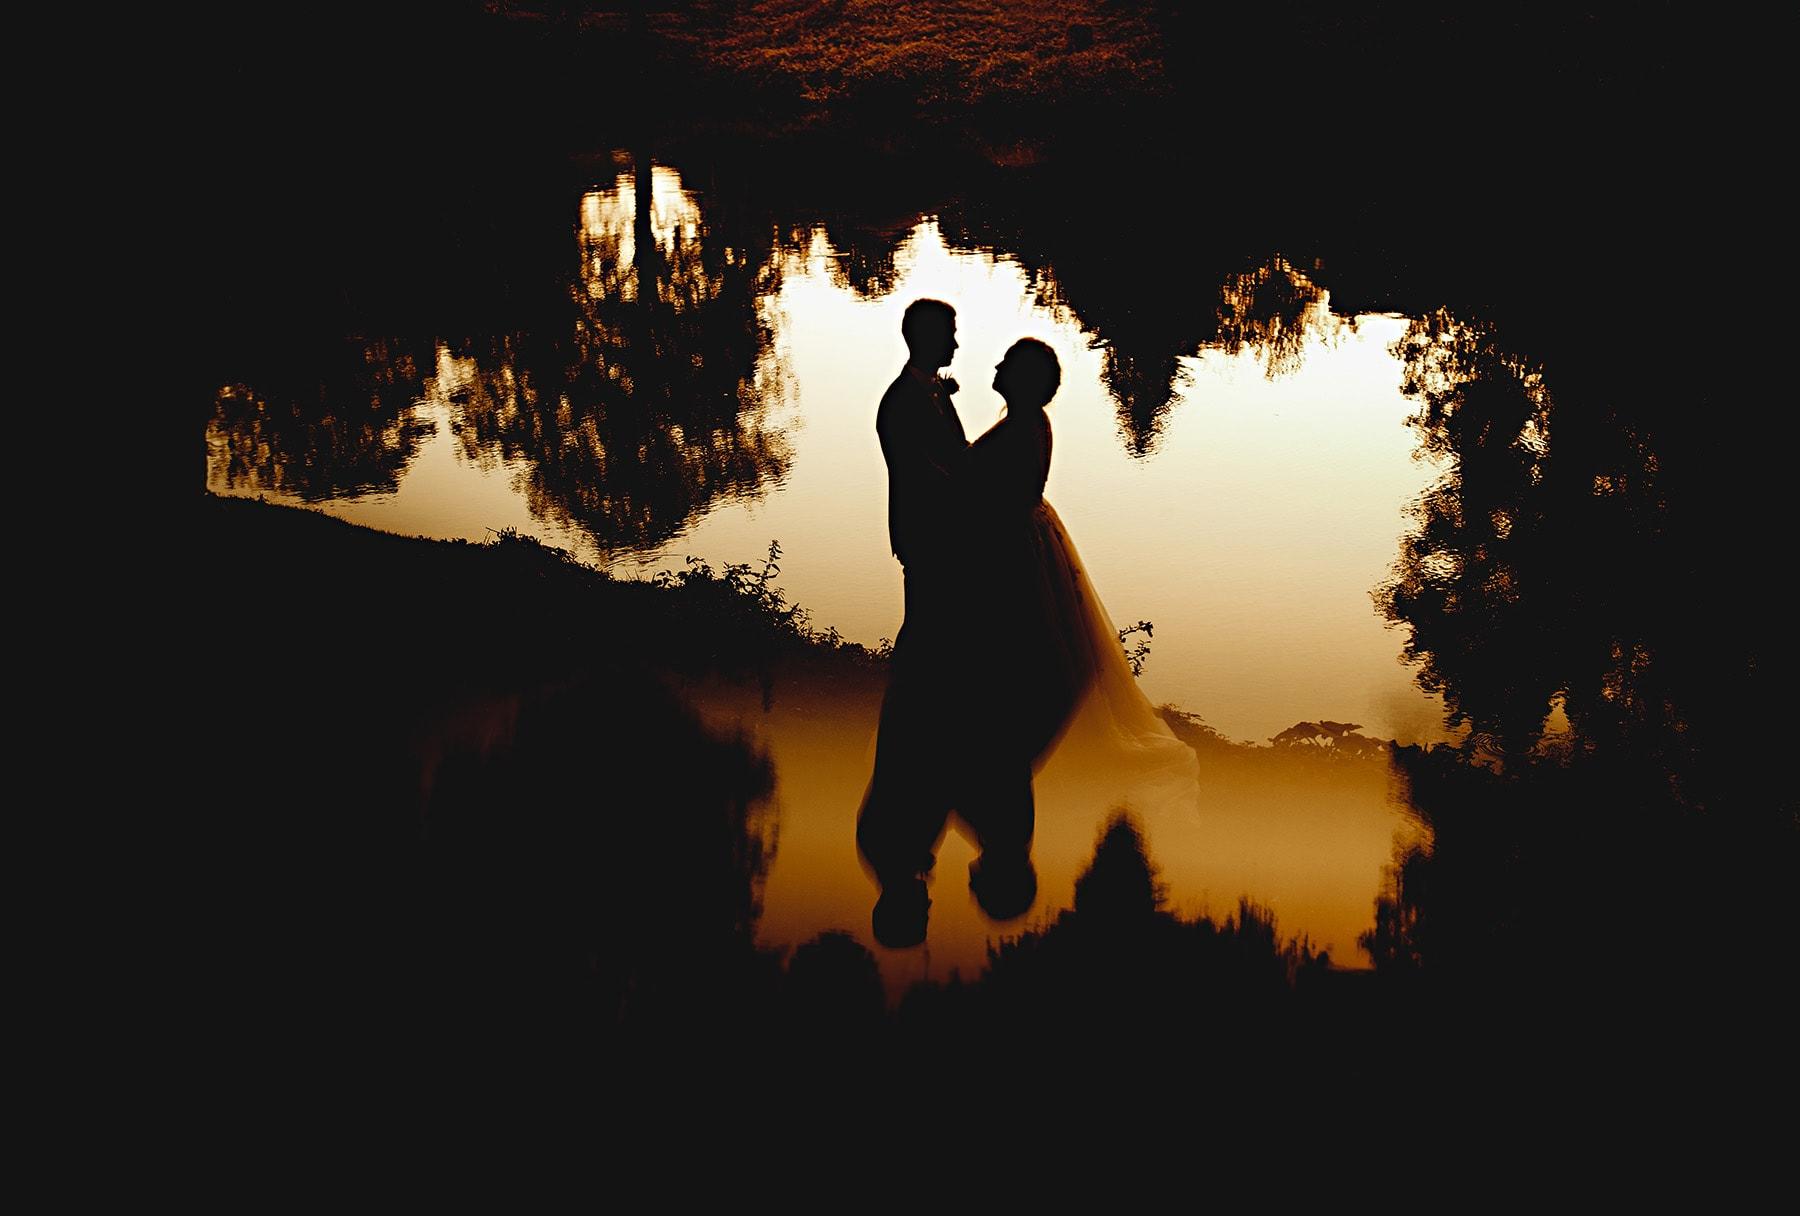 Orange sunlight golden hour on a wedding day